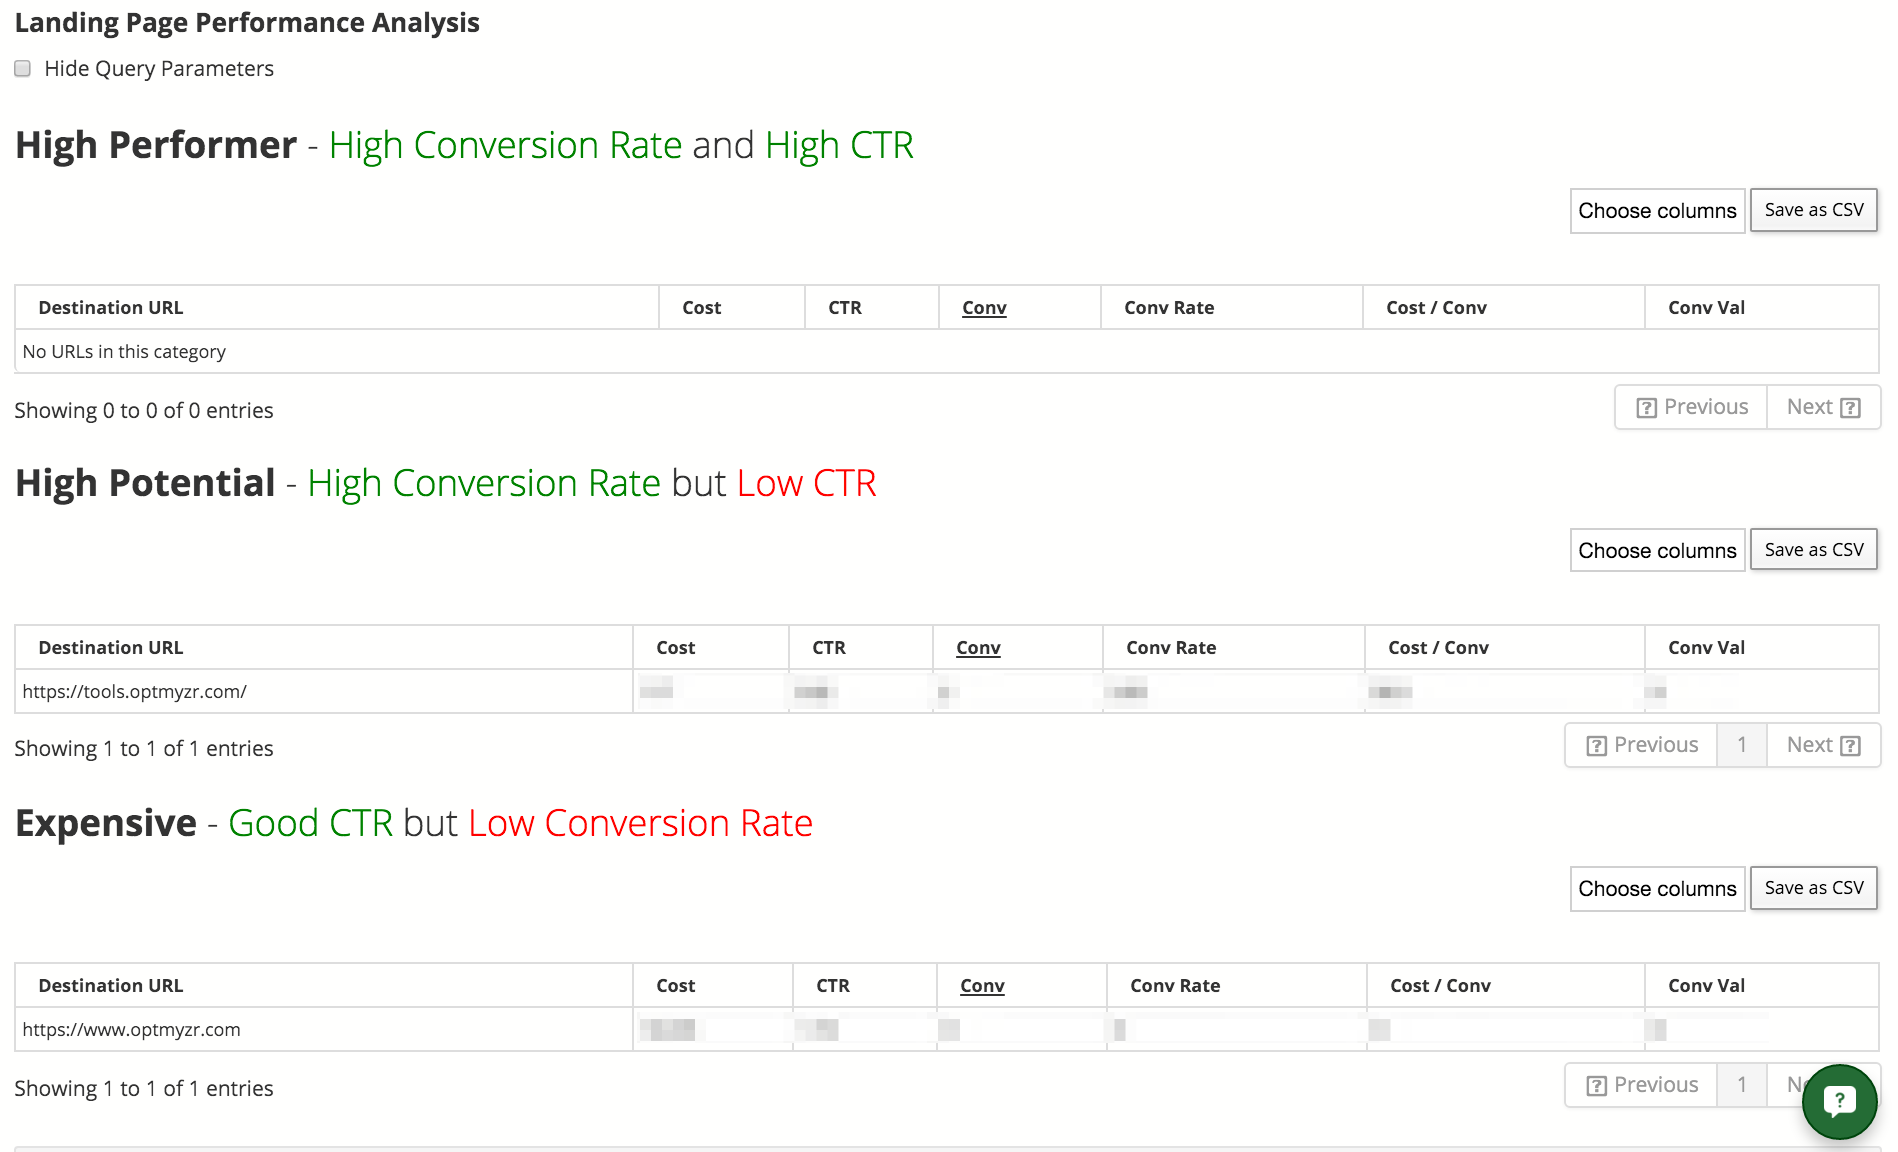 Optmyzr_-_Landing_page_performance_analysis